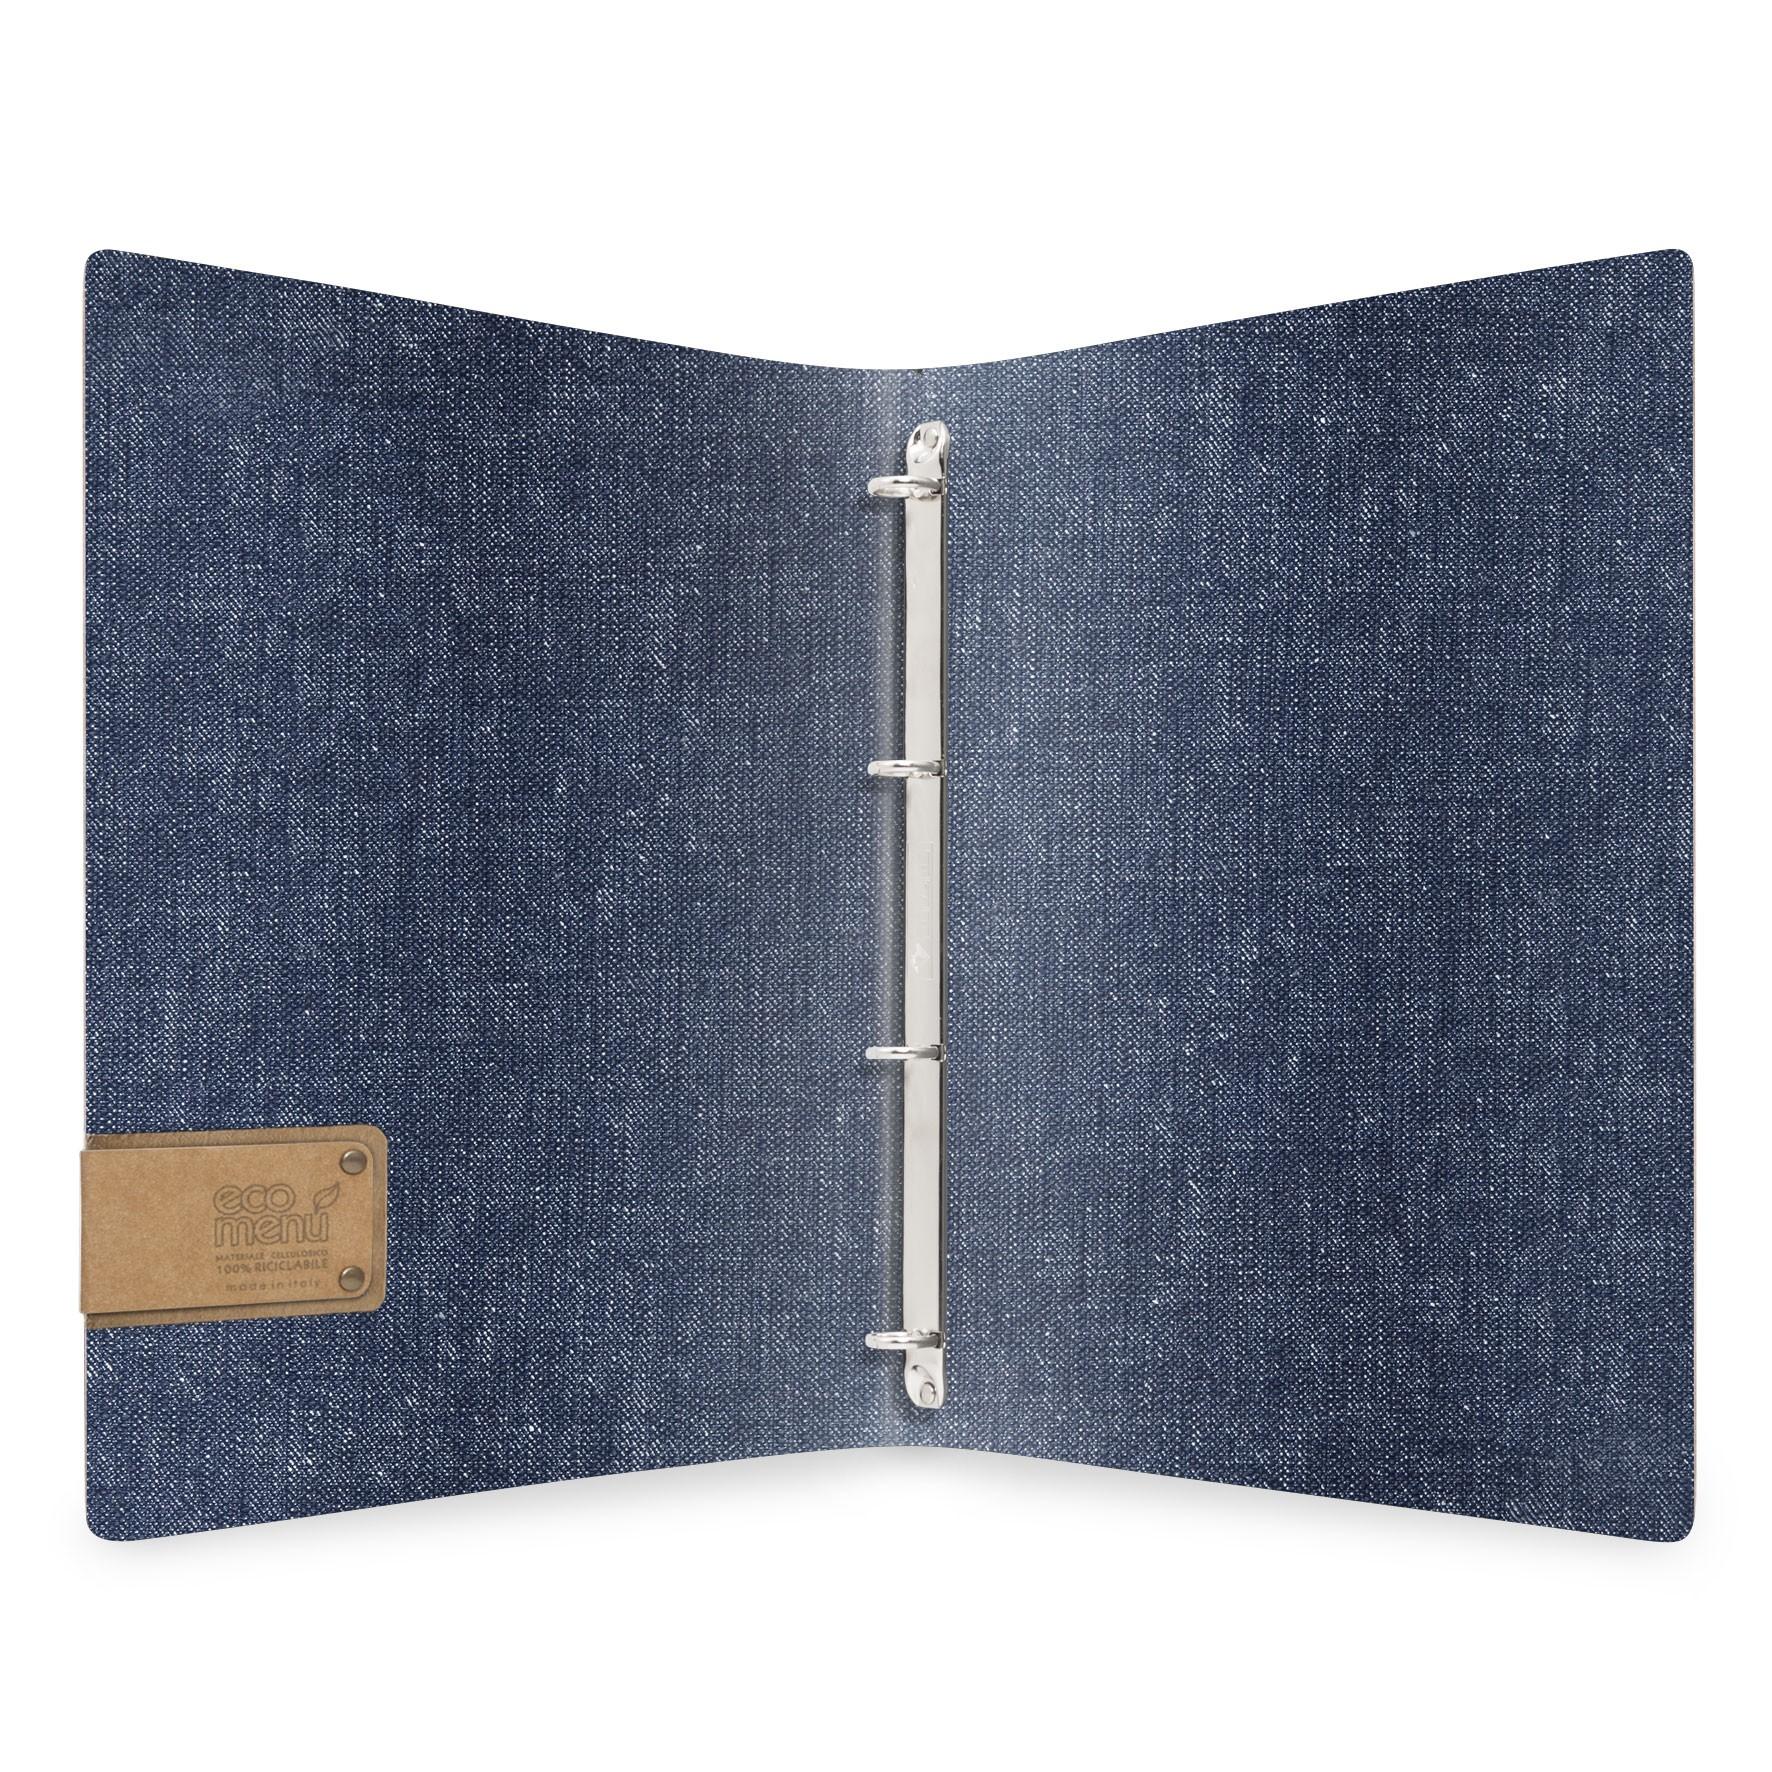 Protège menu MEC MenuMenu bleu aspect jean's